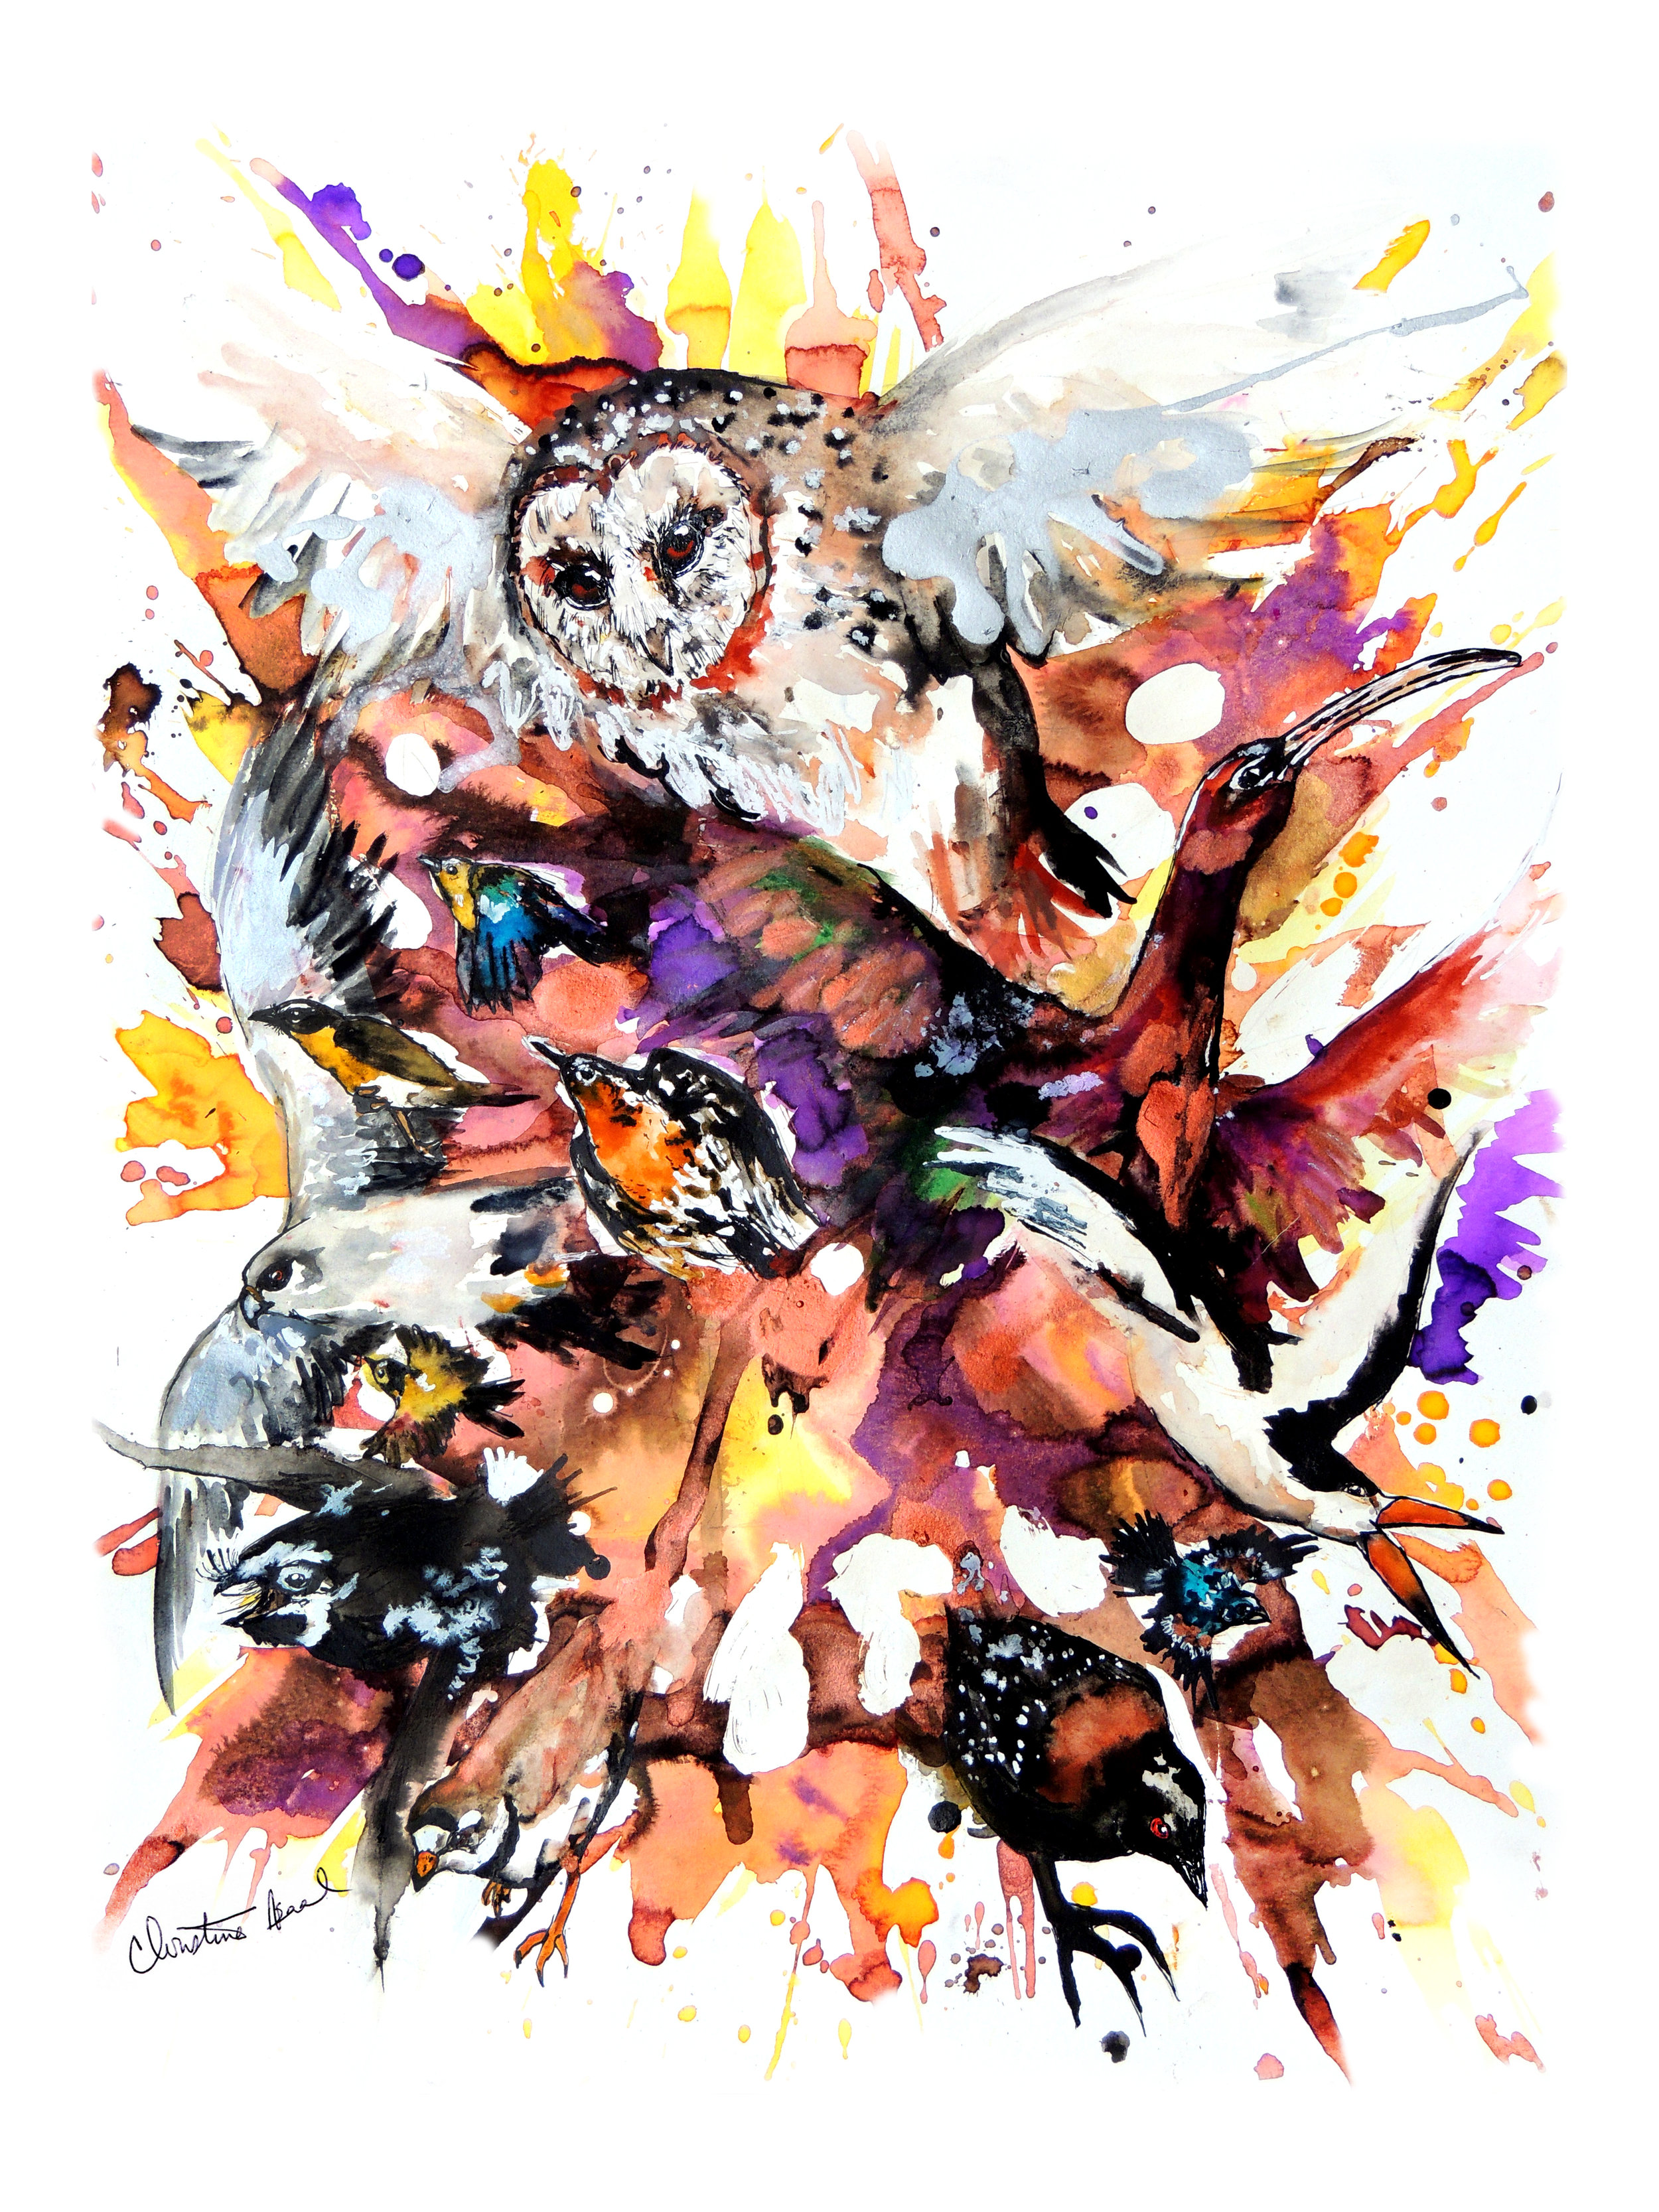 33rd Annual World Series of Birding